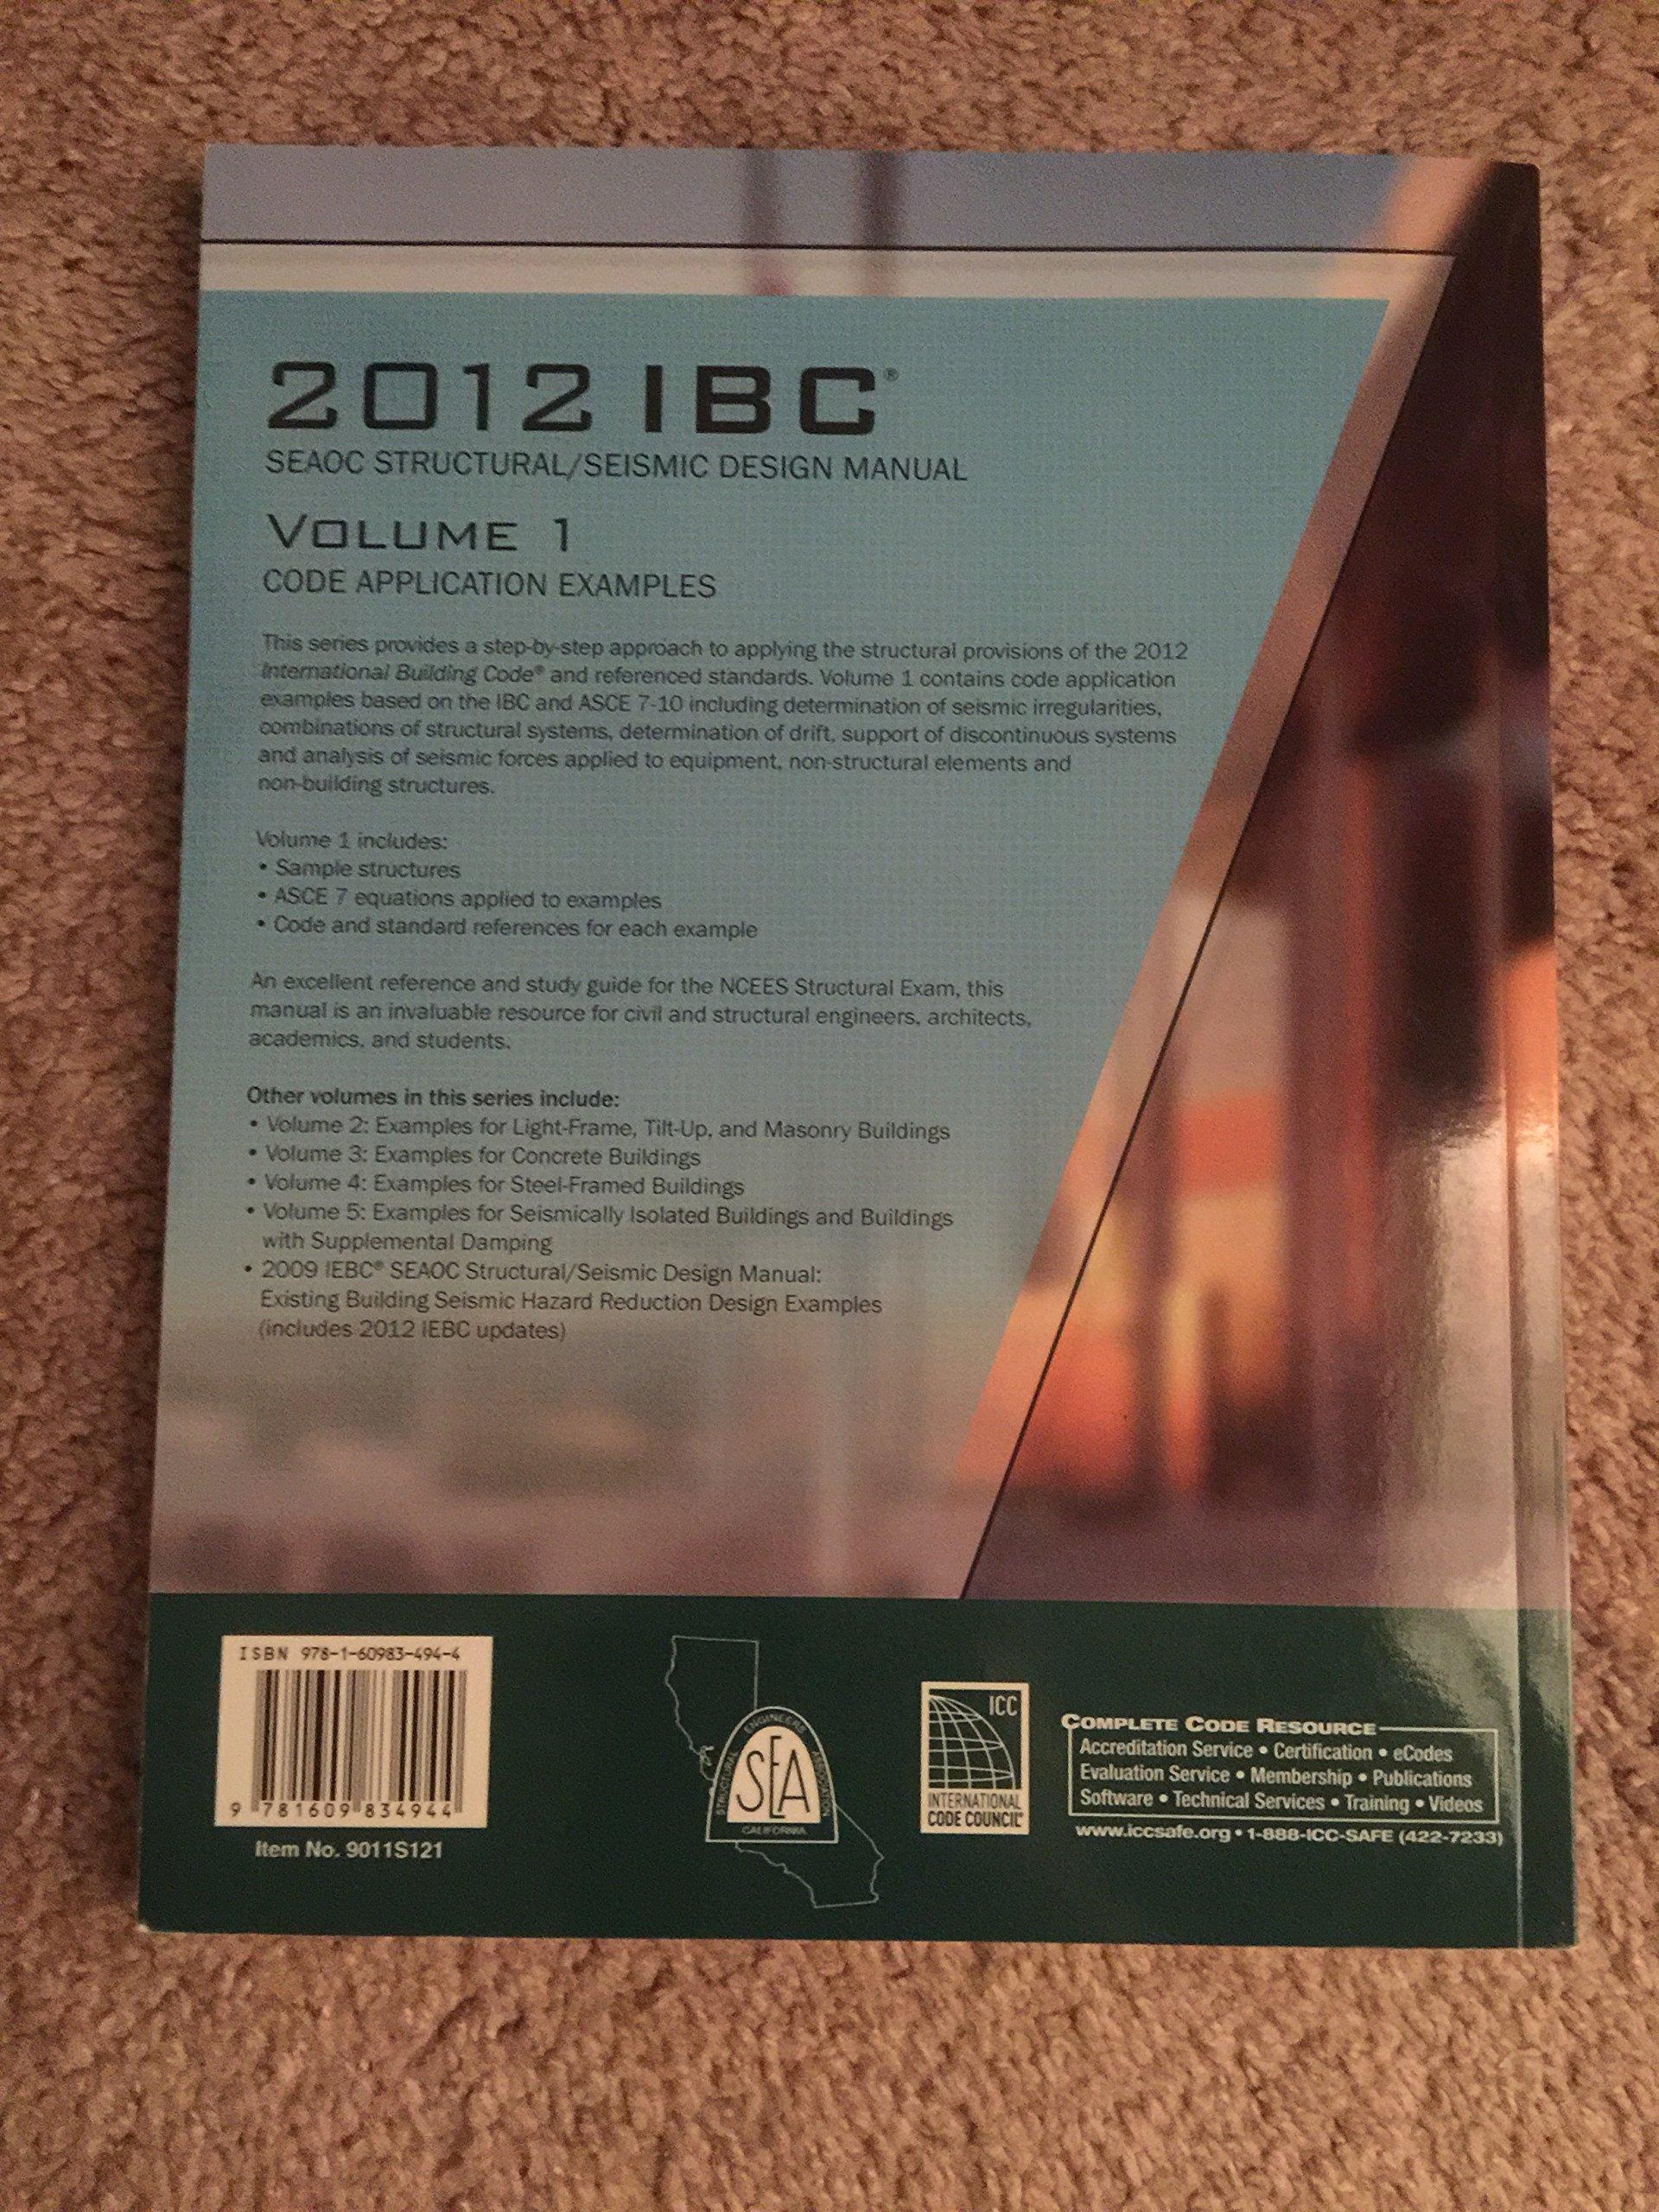 2012 IBC Structural/Seismic Design Manual Volume 1: Code Application  Examples: iccsafe: 9781609834944: Amazon.com: Books